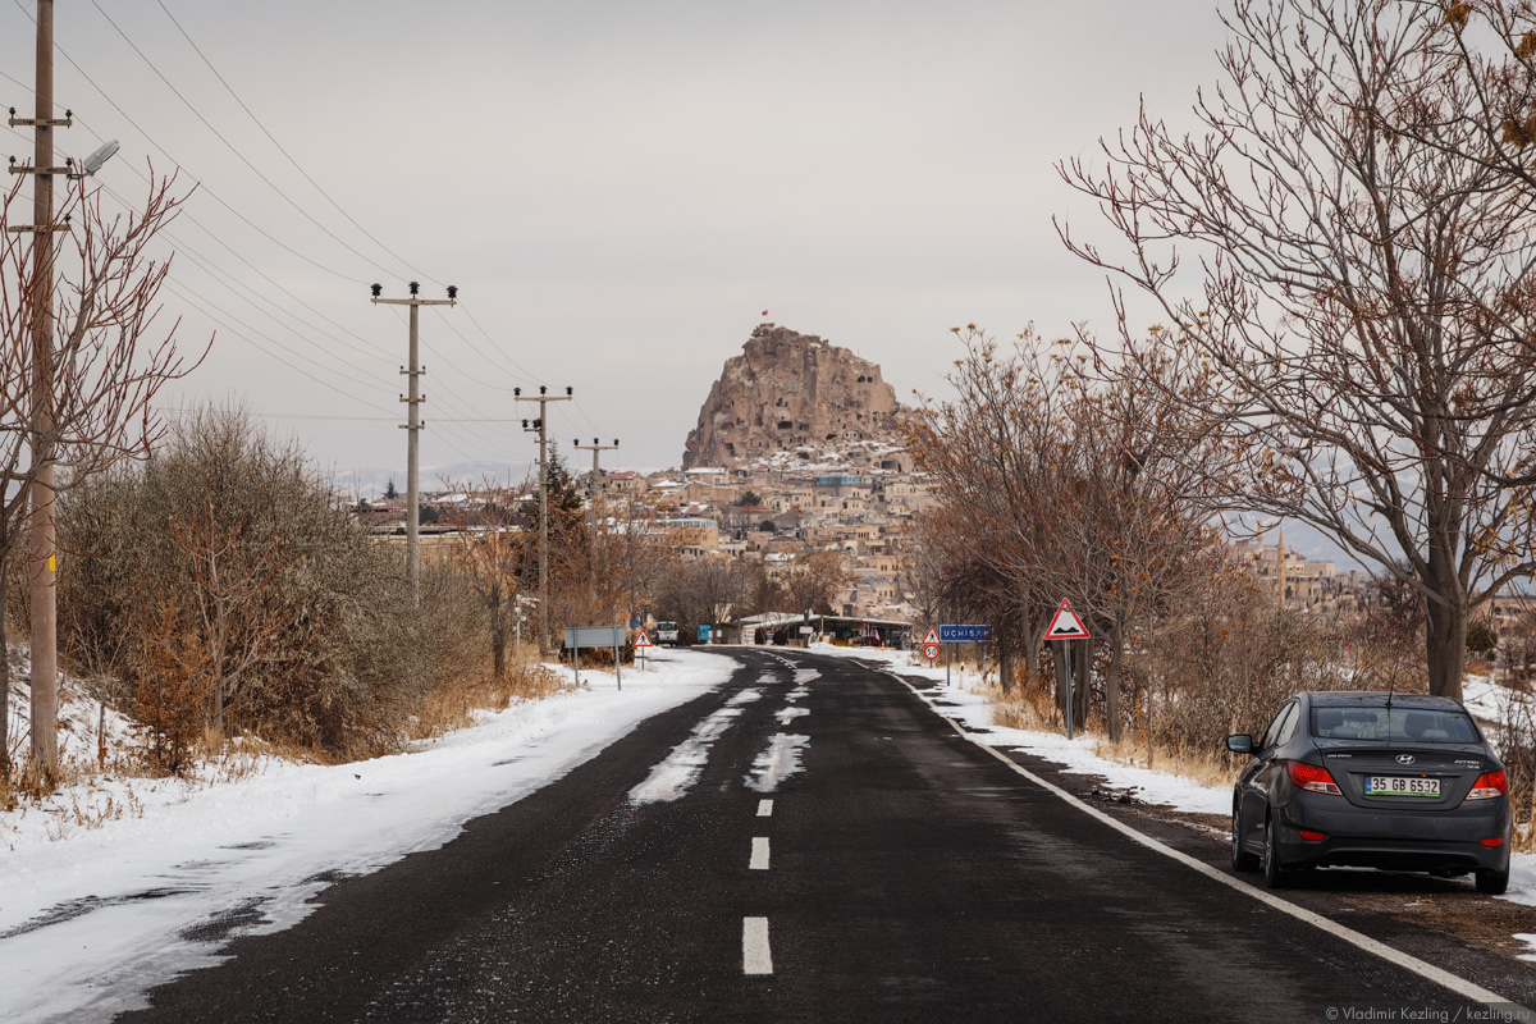 Зимняя Турция. Каппадокия. Две крепости: Ортахисар и Учхисар